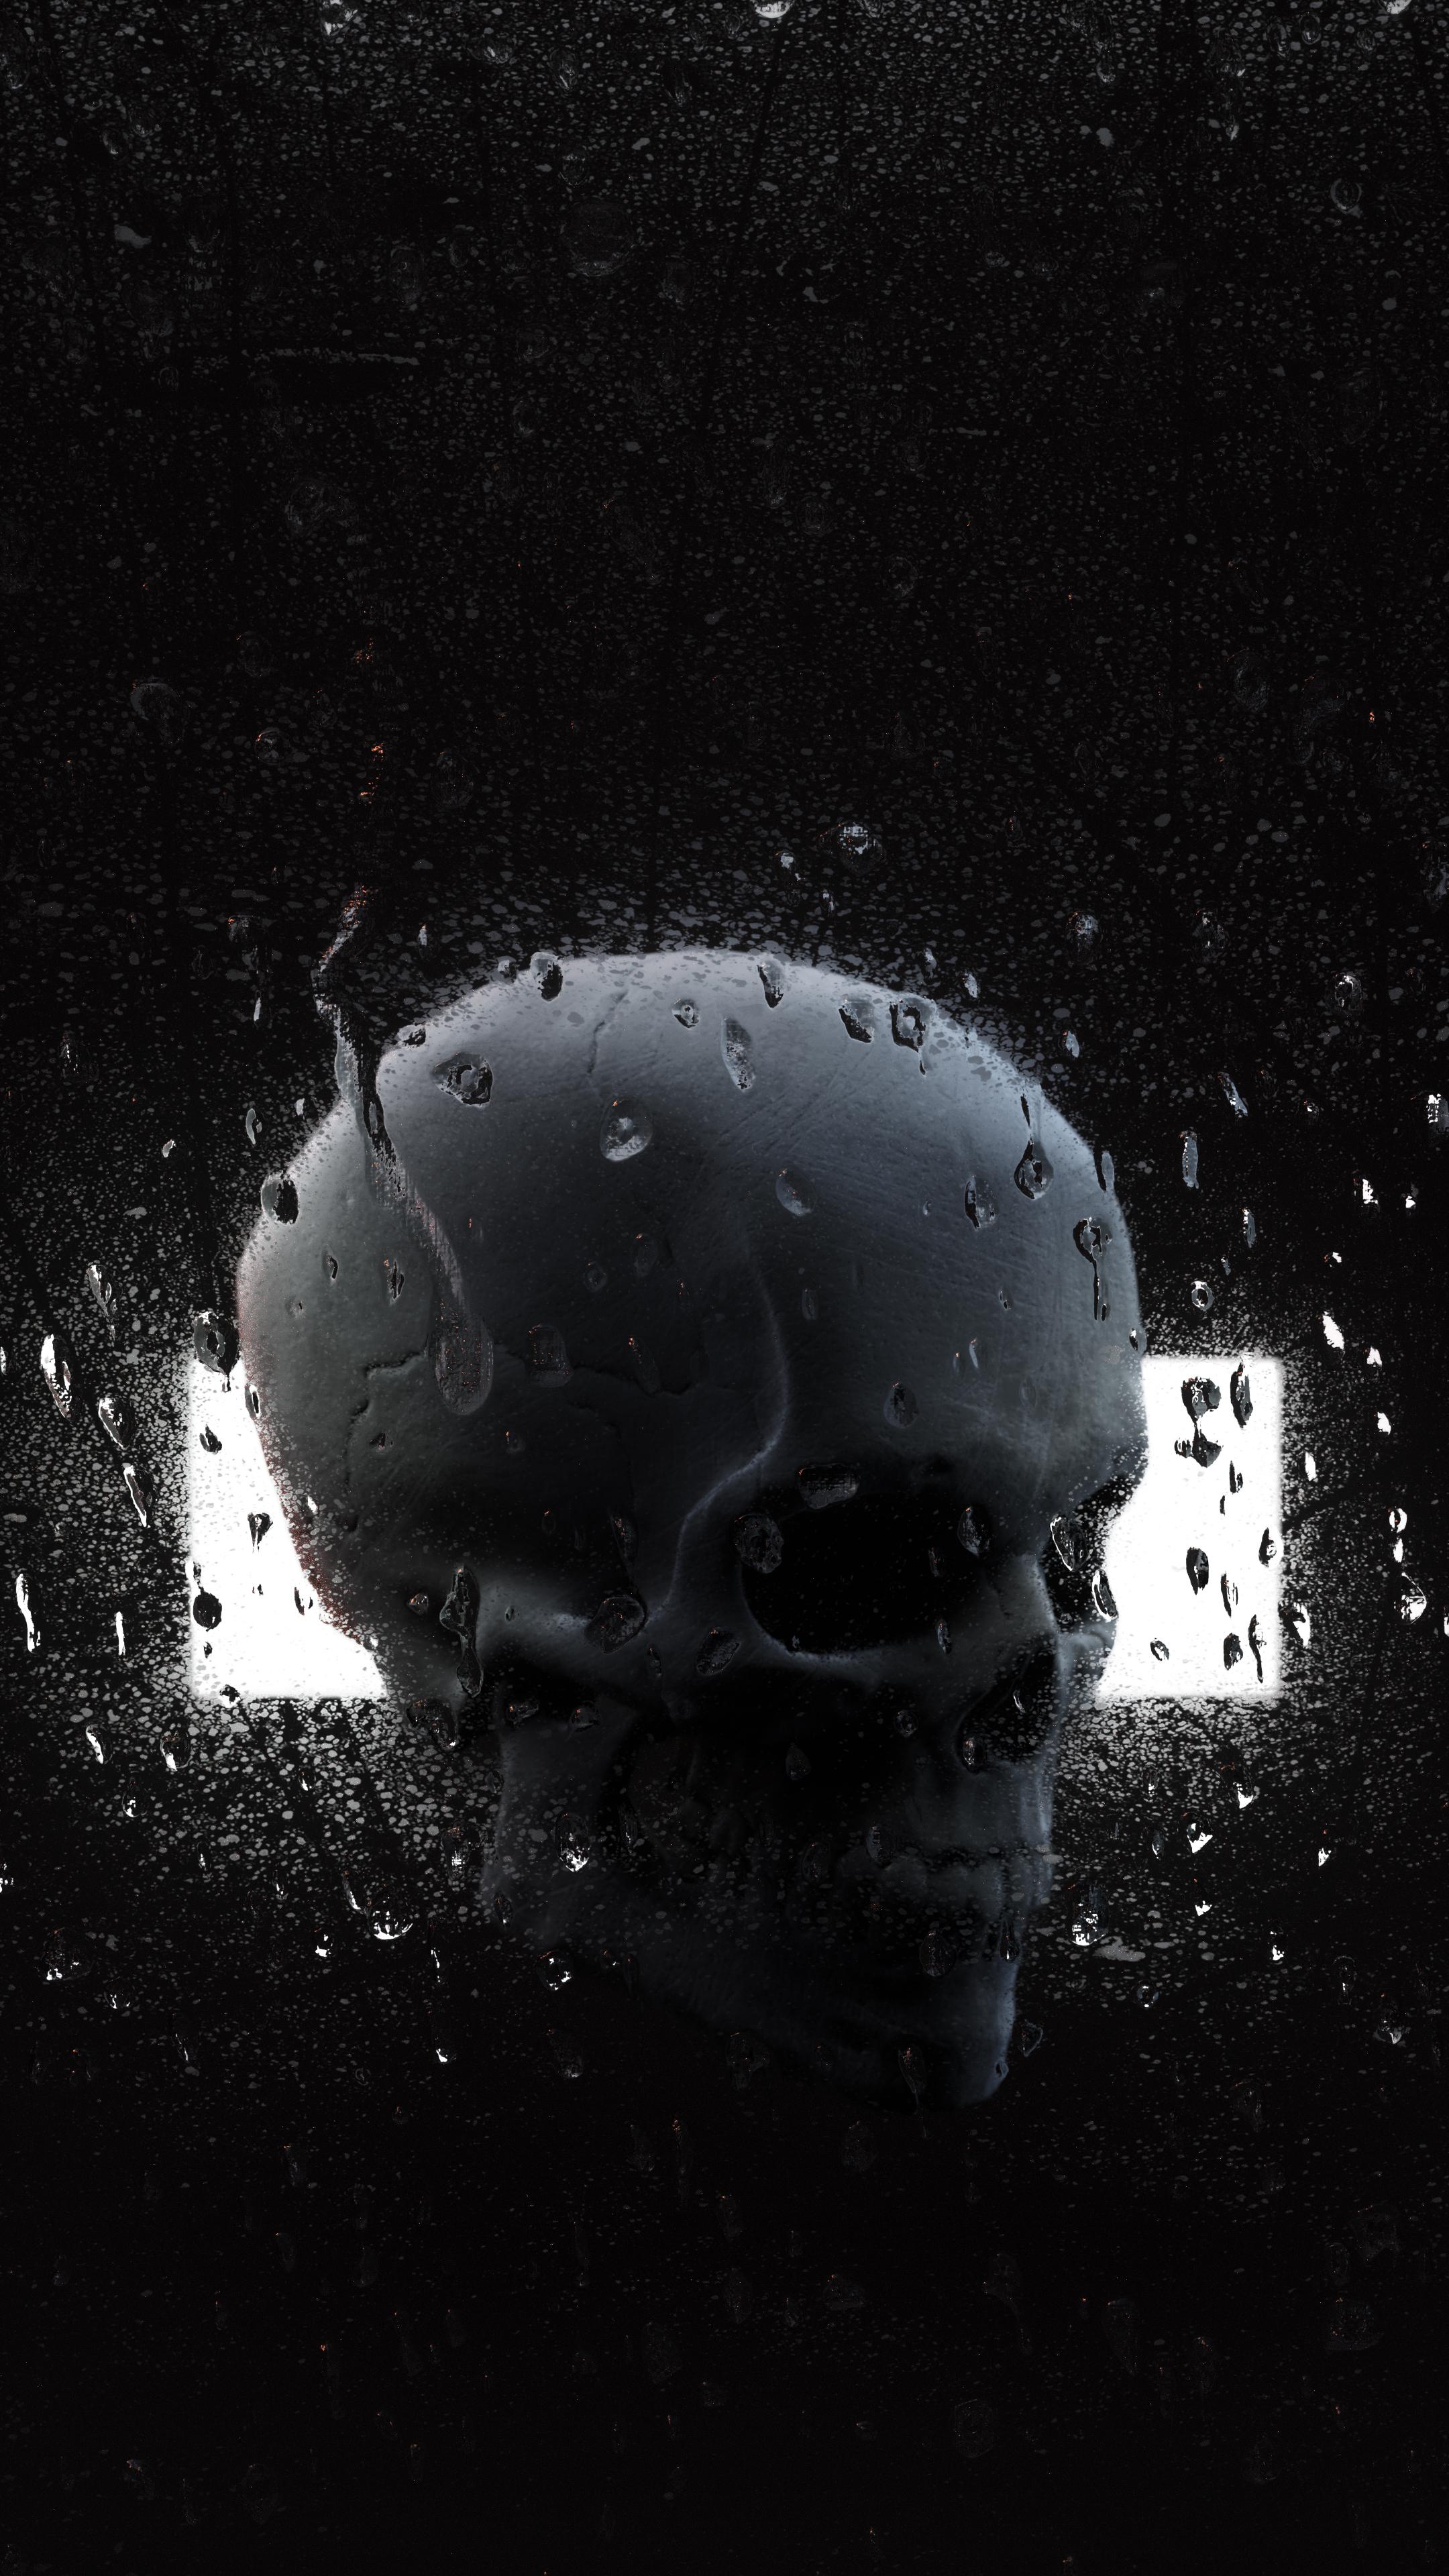 14_Rain_A_001_Comp_FULL.jpg